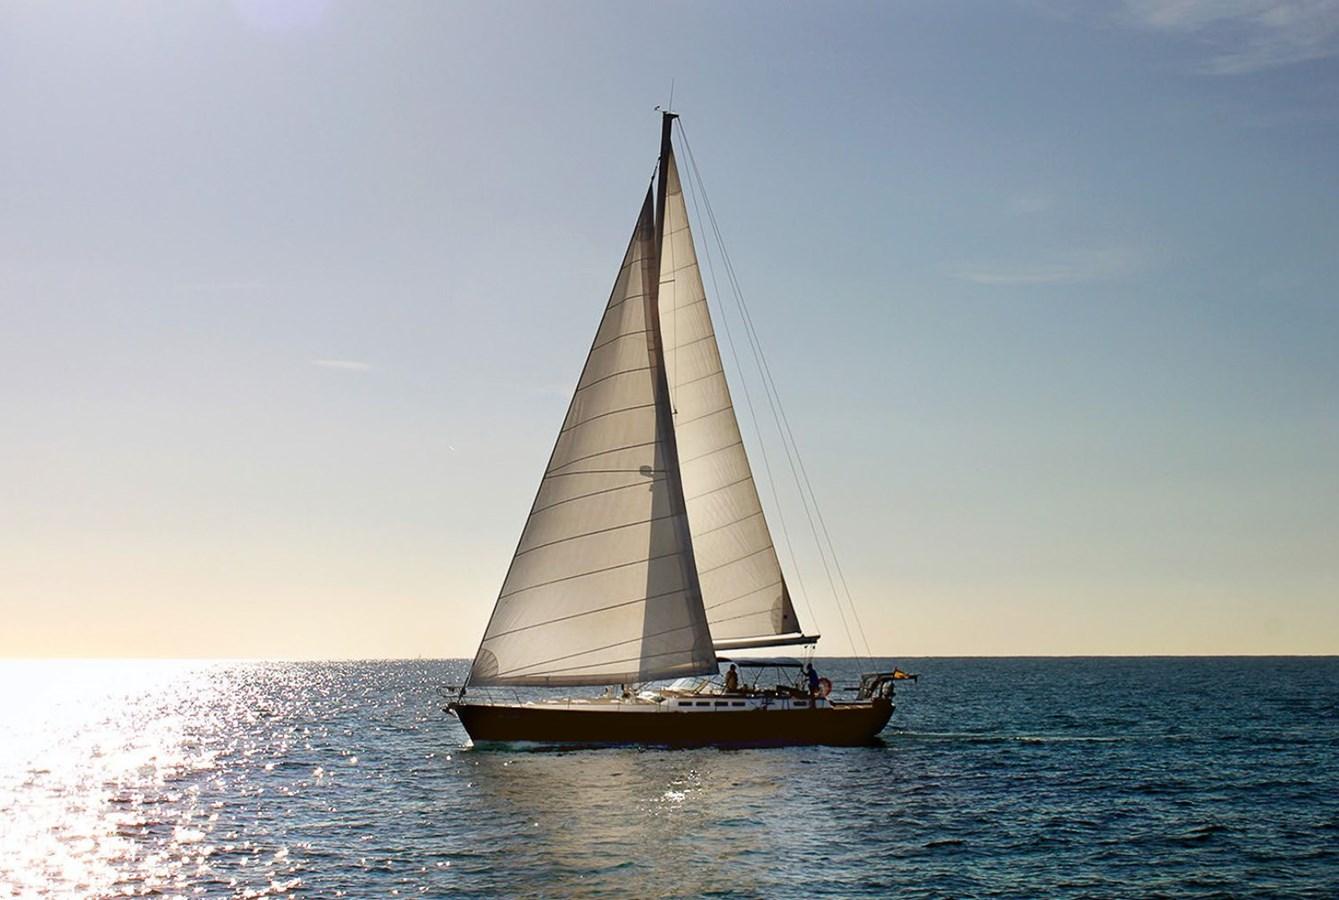 Campeon_Page_1 2006 BENETEAU  Cruising Sailboat 2791981